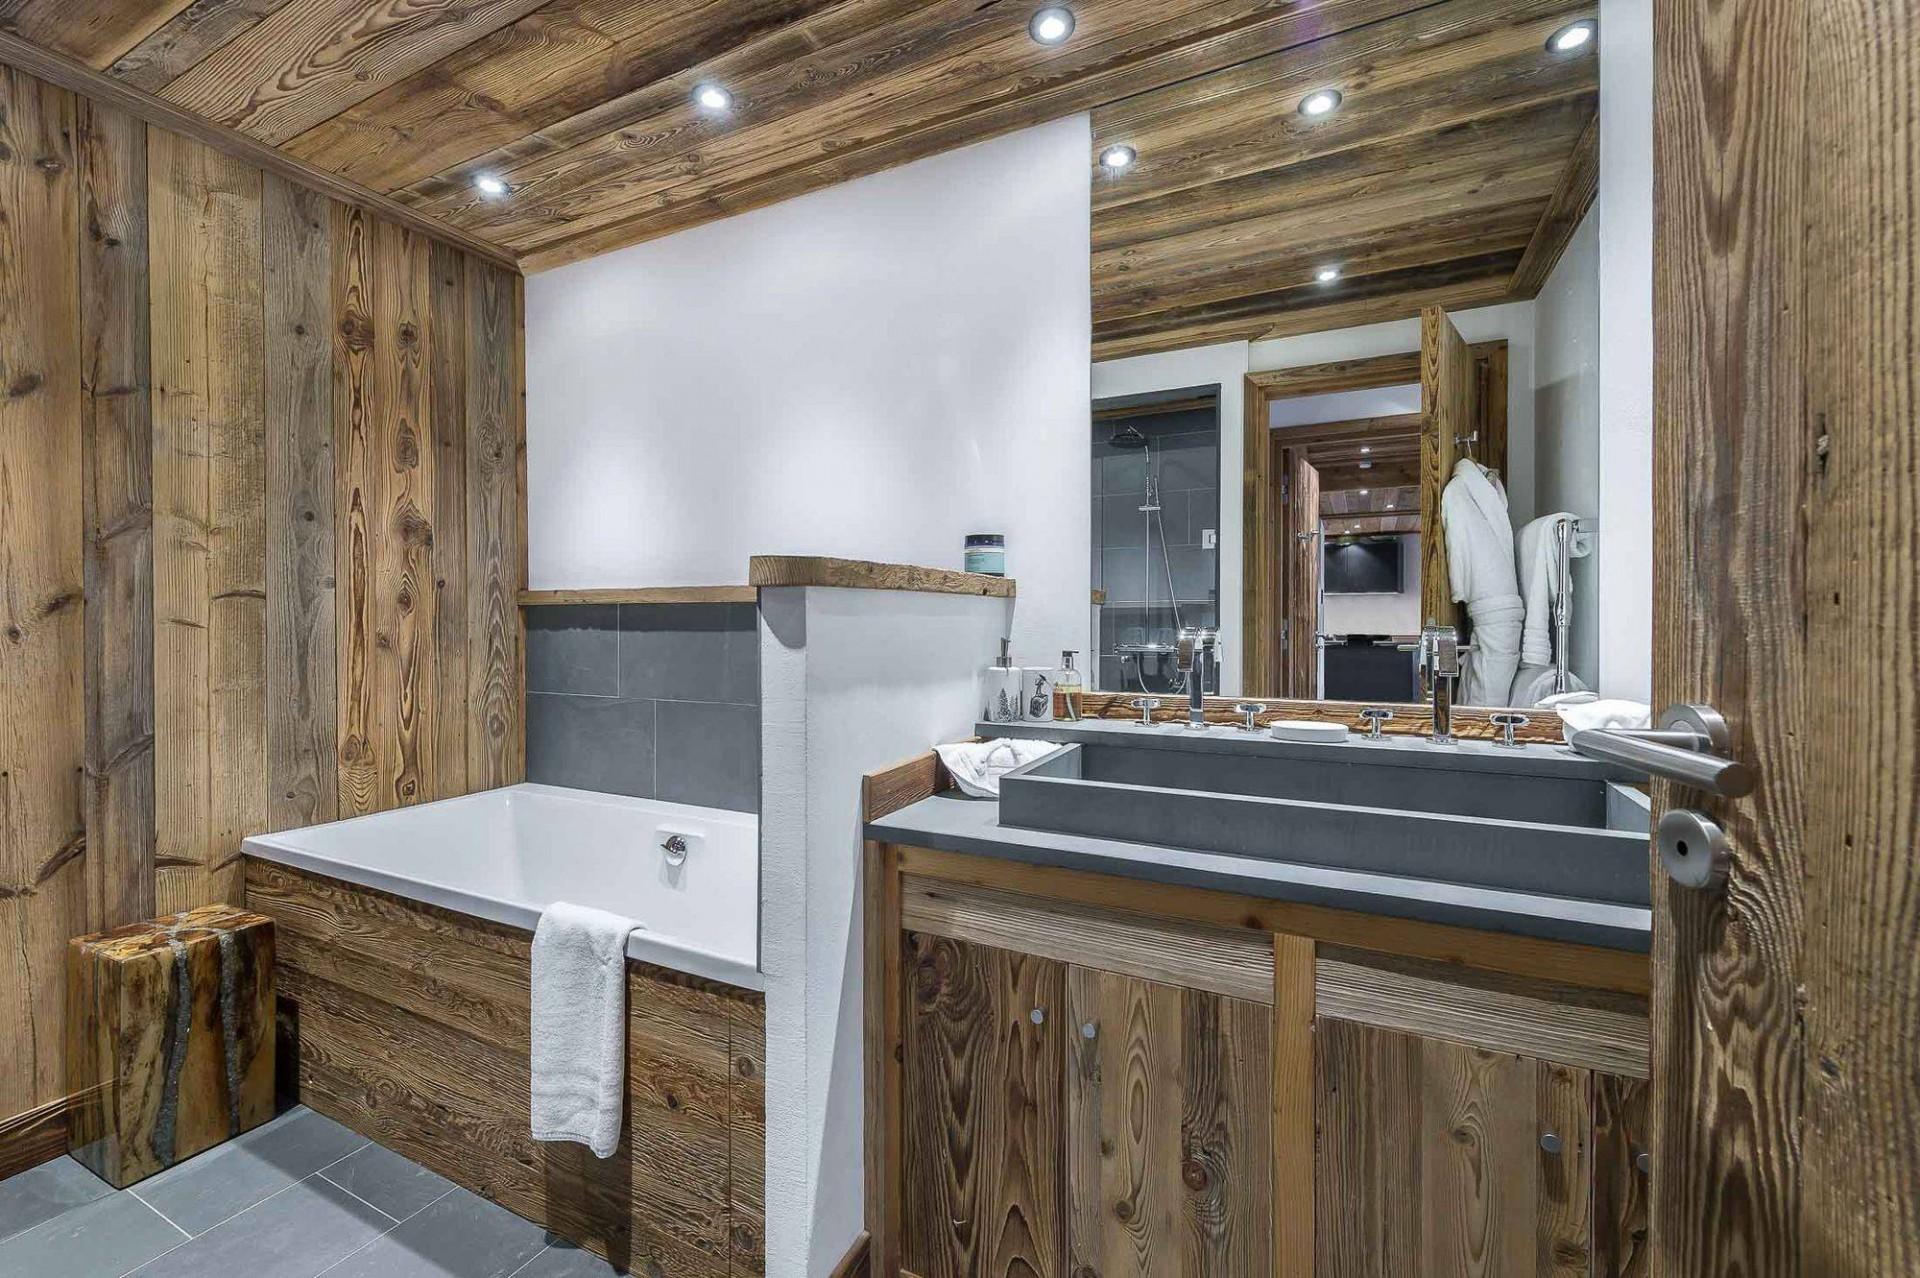 Val d'Isère Location Appartement Luxe Ulolite Salle De Bain